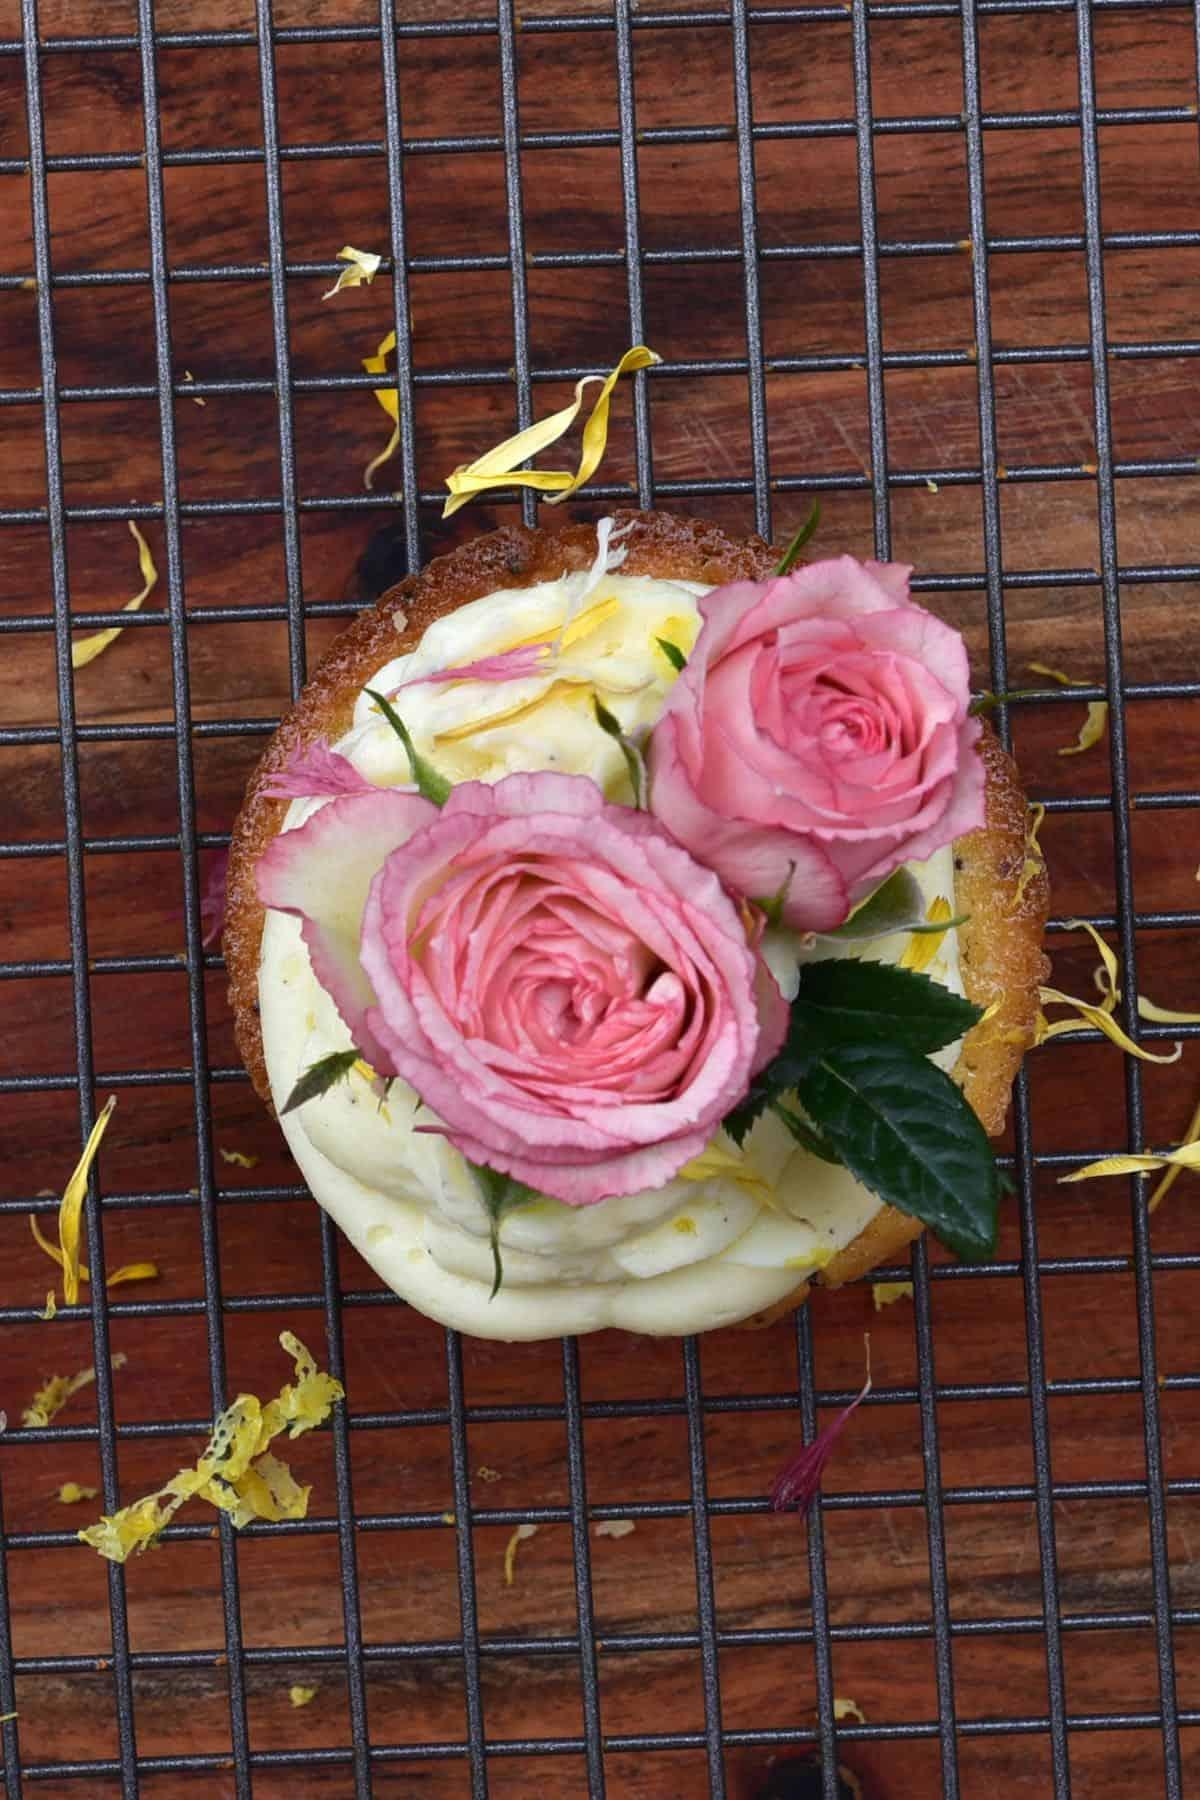 Top view of lemon cupcake with roses